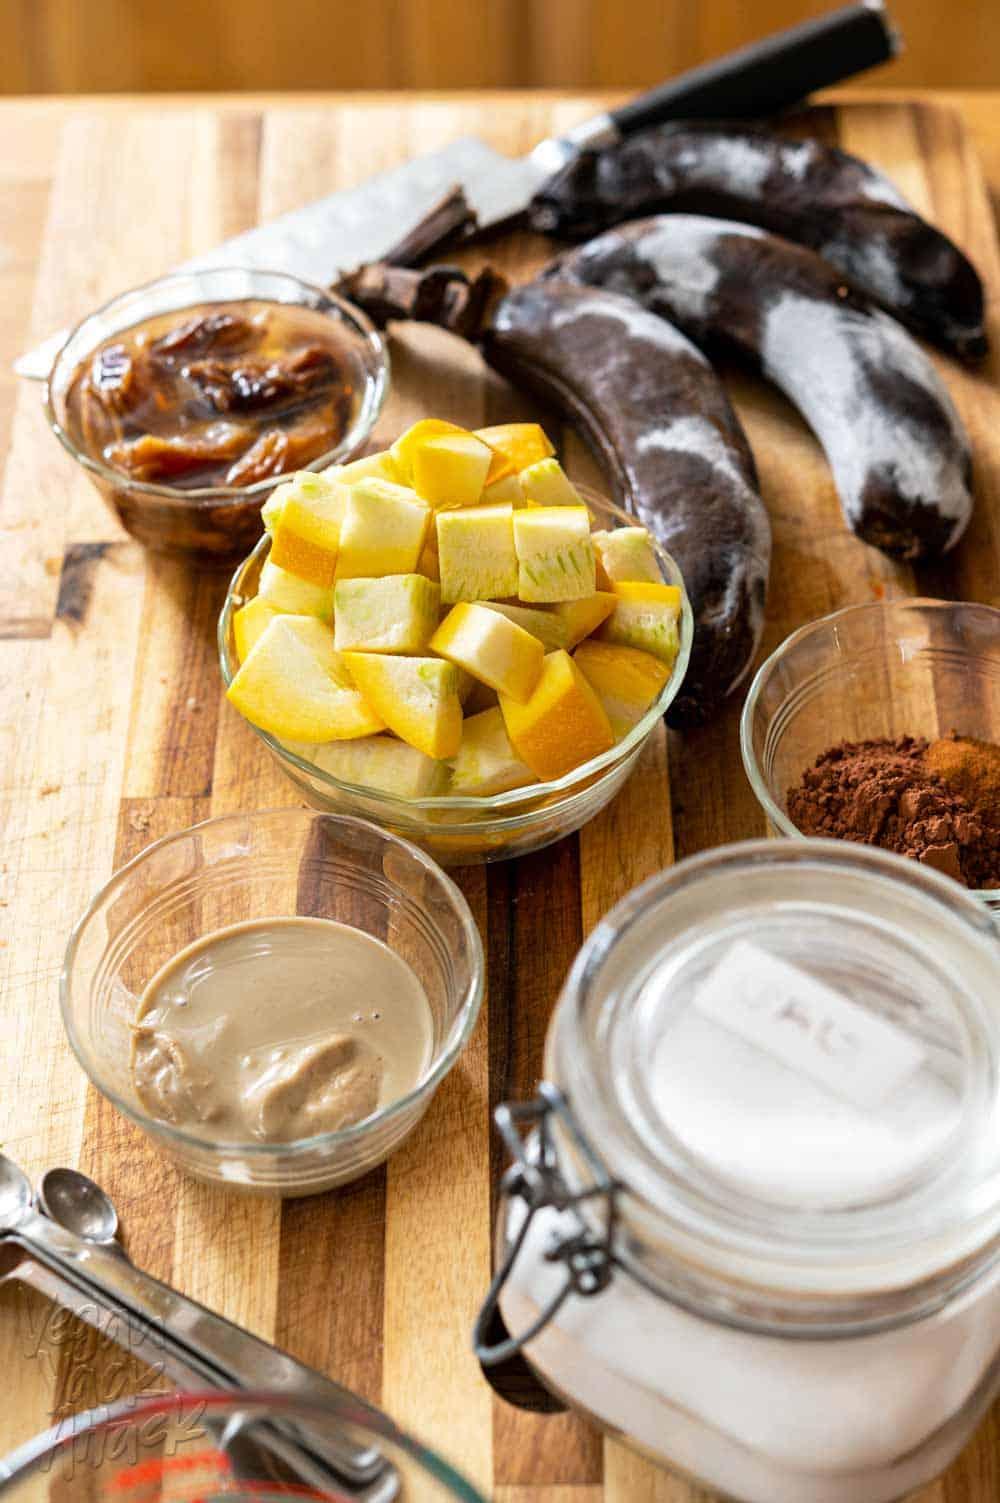 Squash, tahini, cocoa powder, salt, banana, dates, and salt on a cutting board